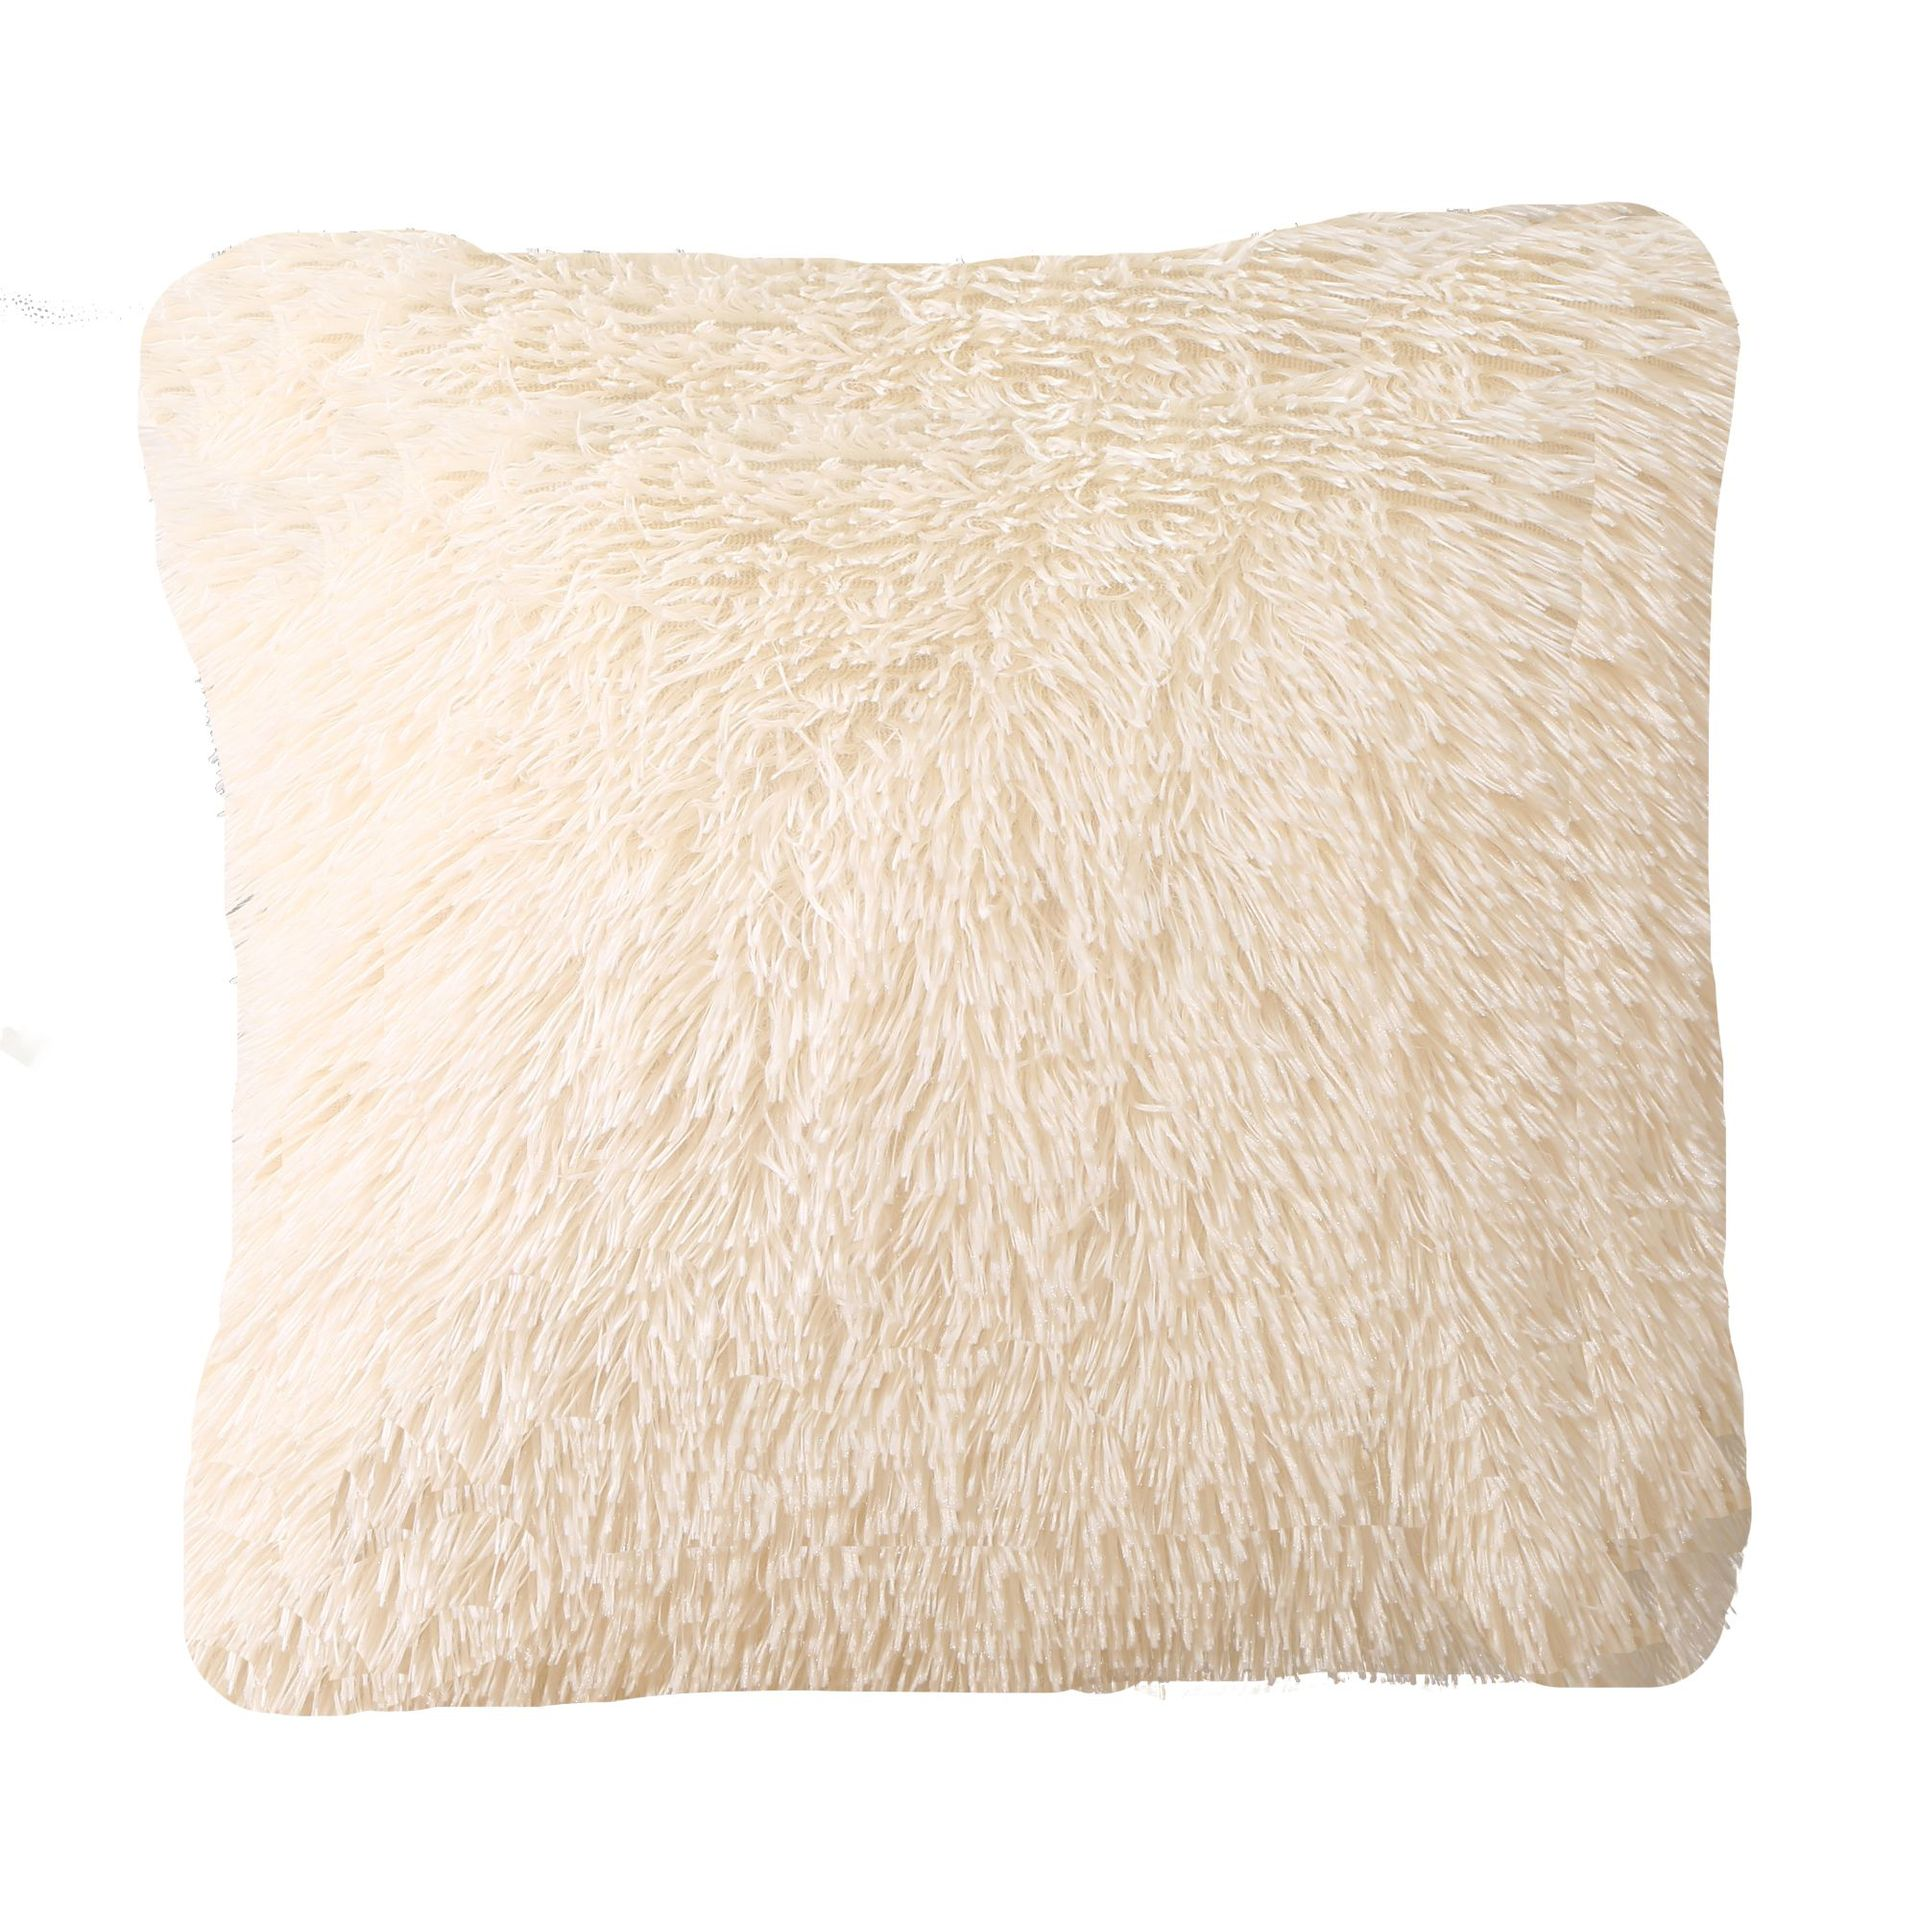 Super Furry Plush Pillow Case for Warm Sofa Sets